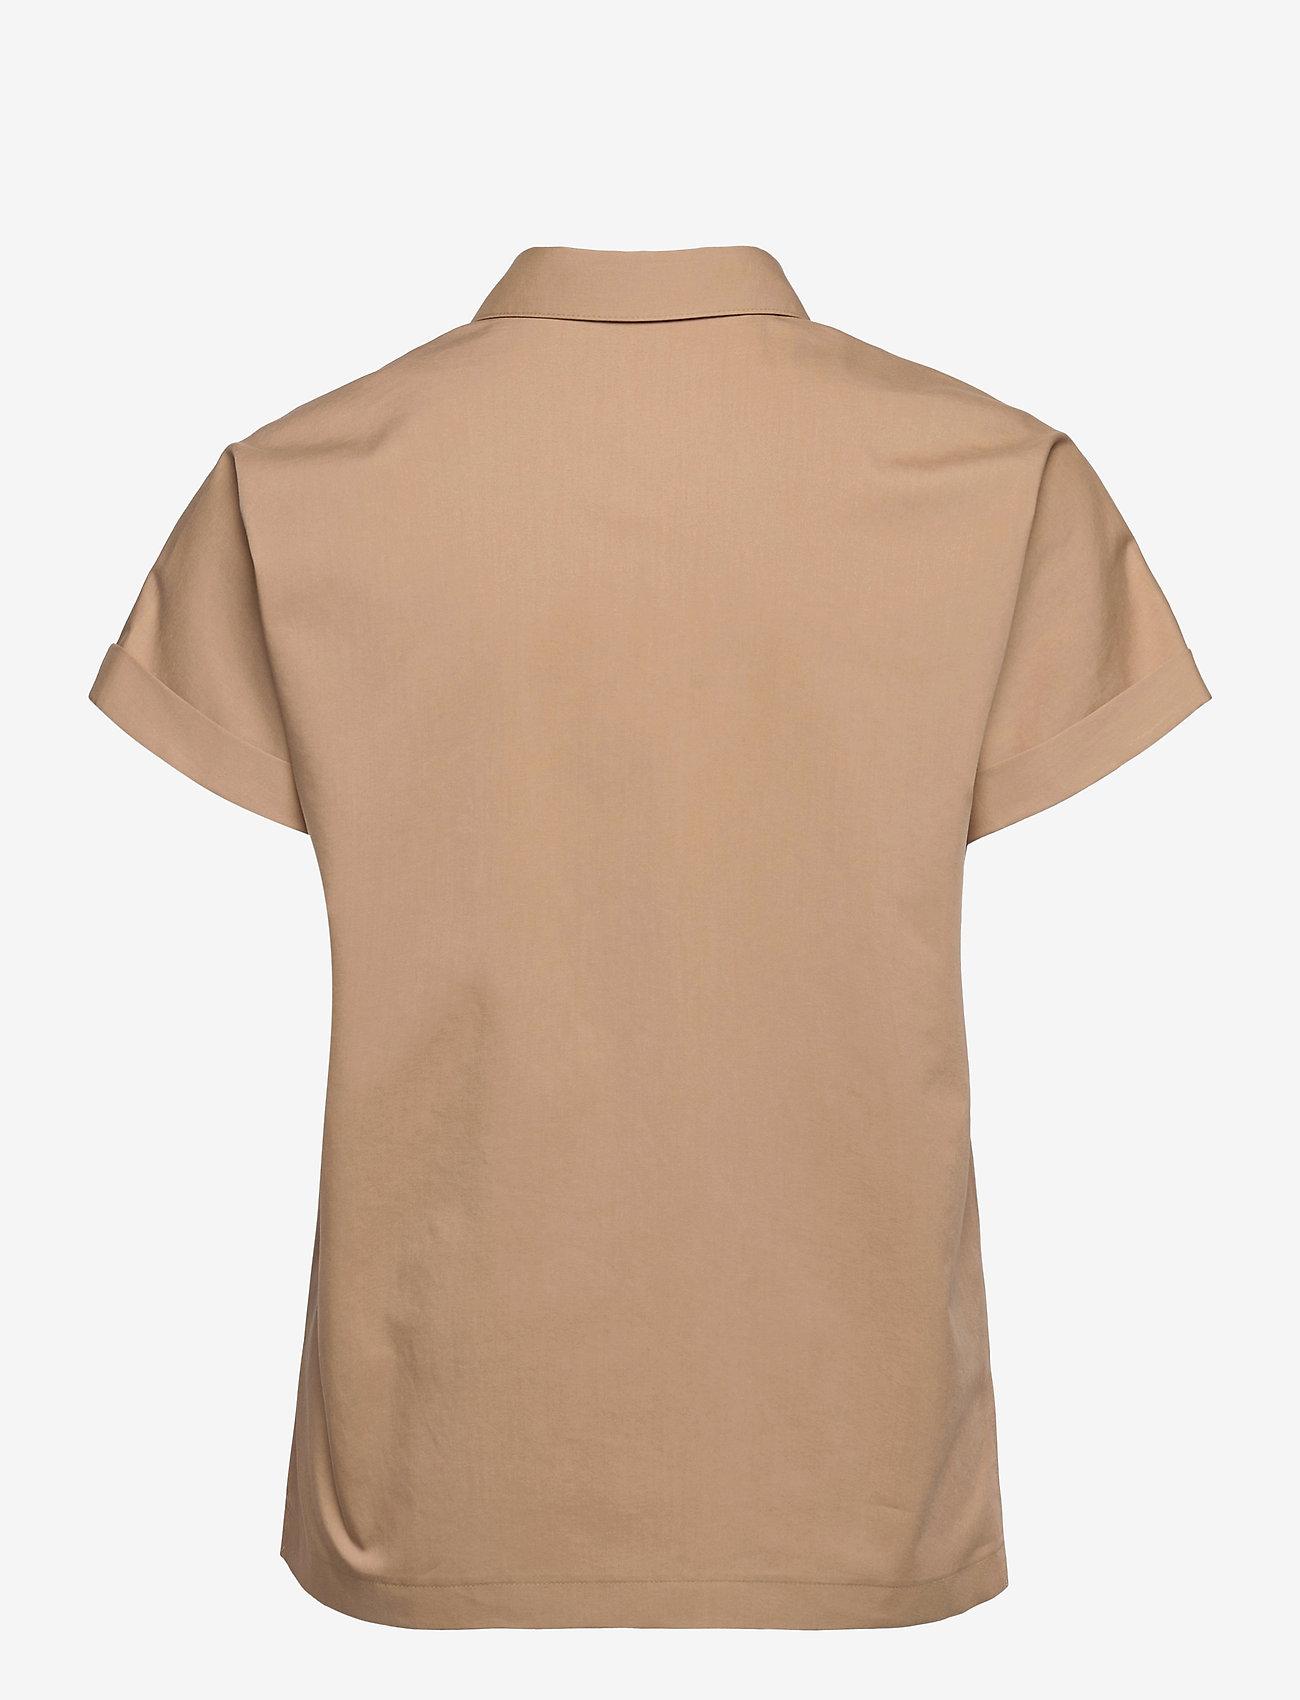 BOSS - Baranda - chemises à manches courtes - medium beige - 1